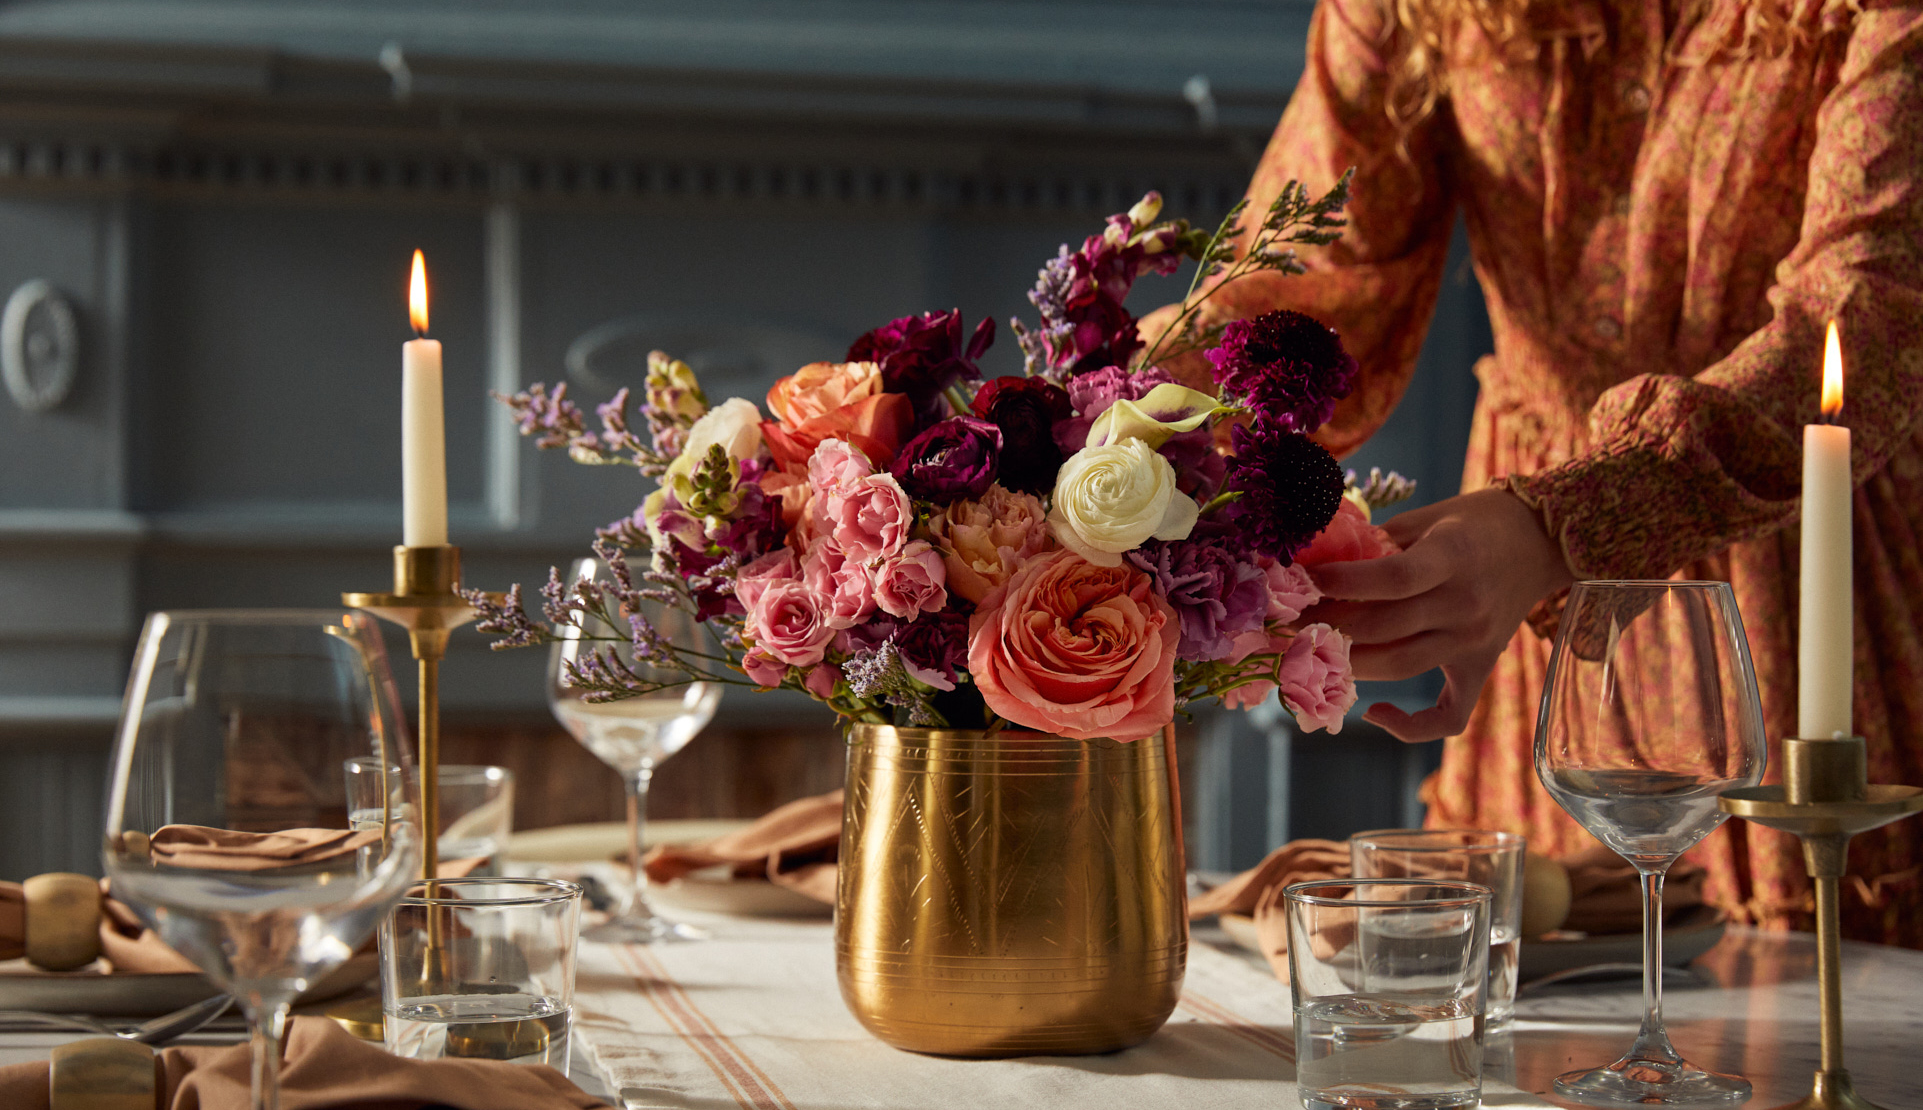 DIY fall floral centerpiece for entertaining